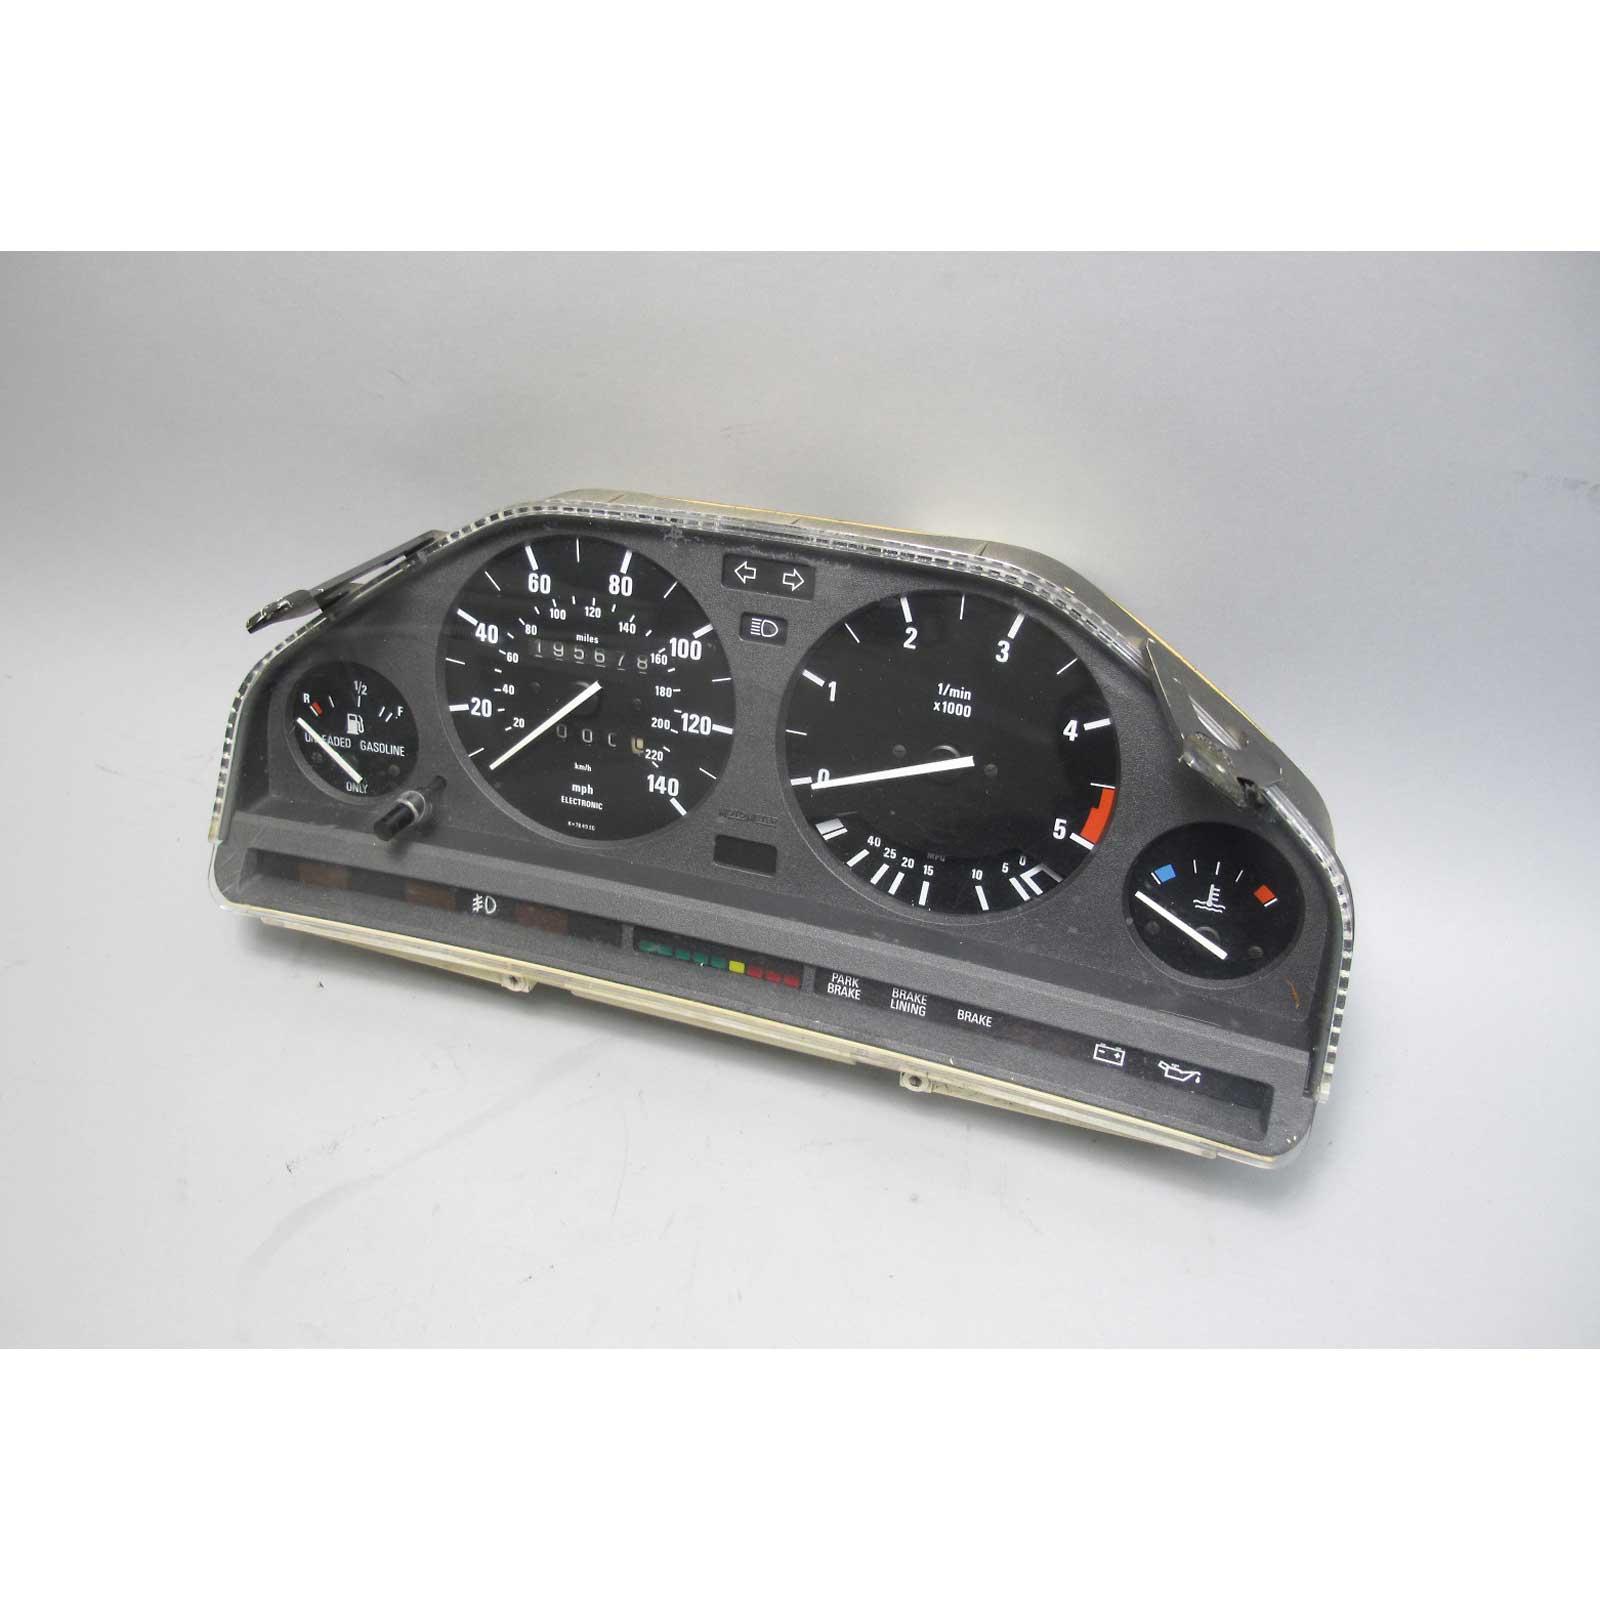 For-Parts BMW E30 318i 325e Instrument Gauge Cluster Panel Speedo ...